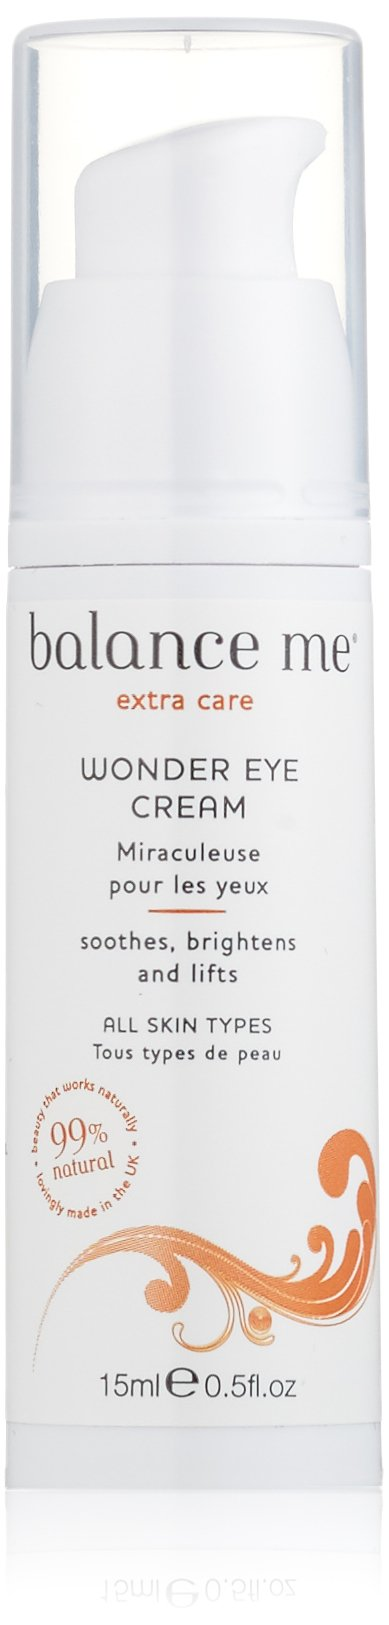 Balance Me Wonder Eye Cream (15Ml)